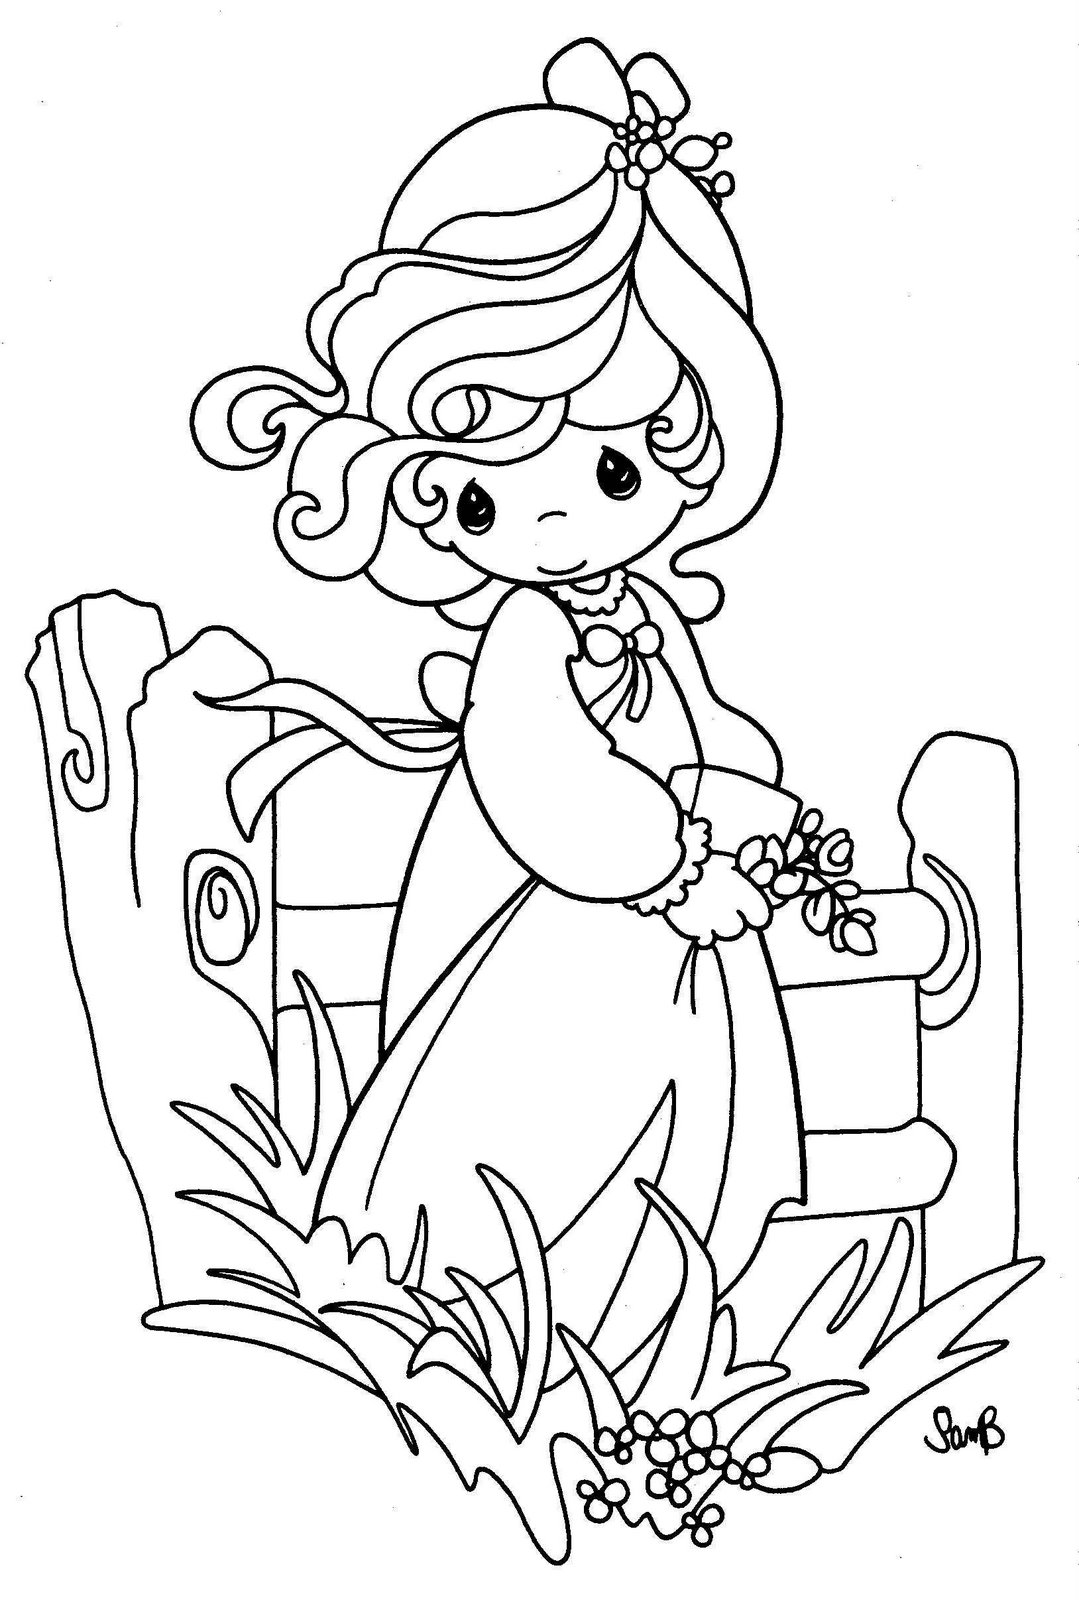 Dibujos infantiles para colorear preciosos momentos - Imagui